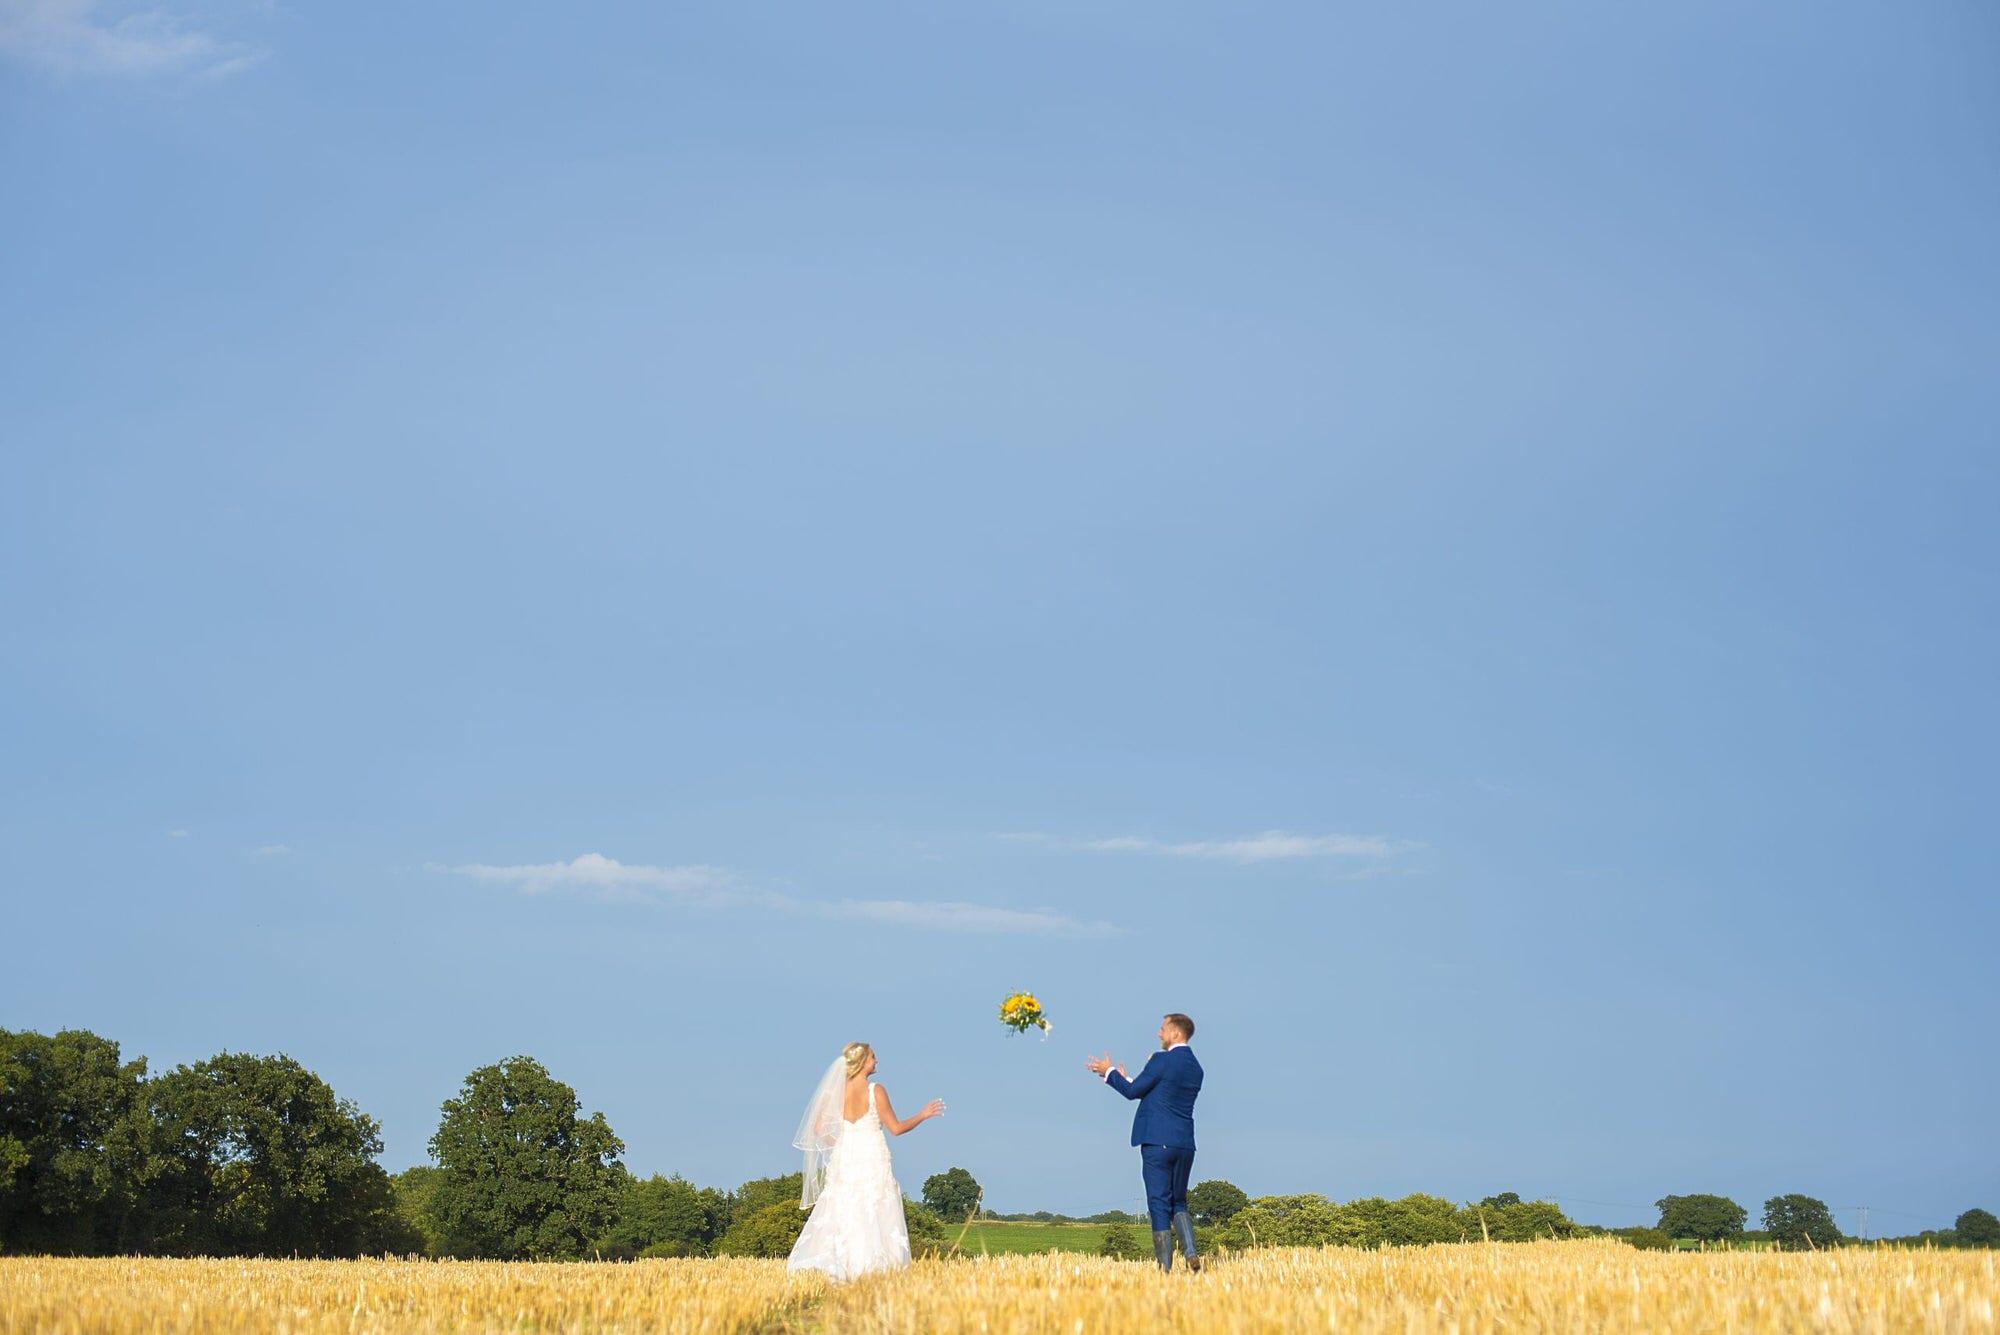 Summer walks catching the wedding bouquet